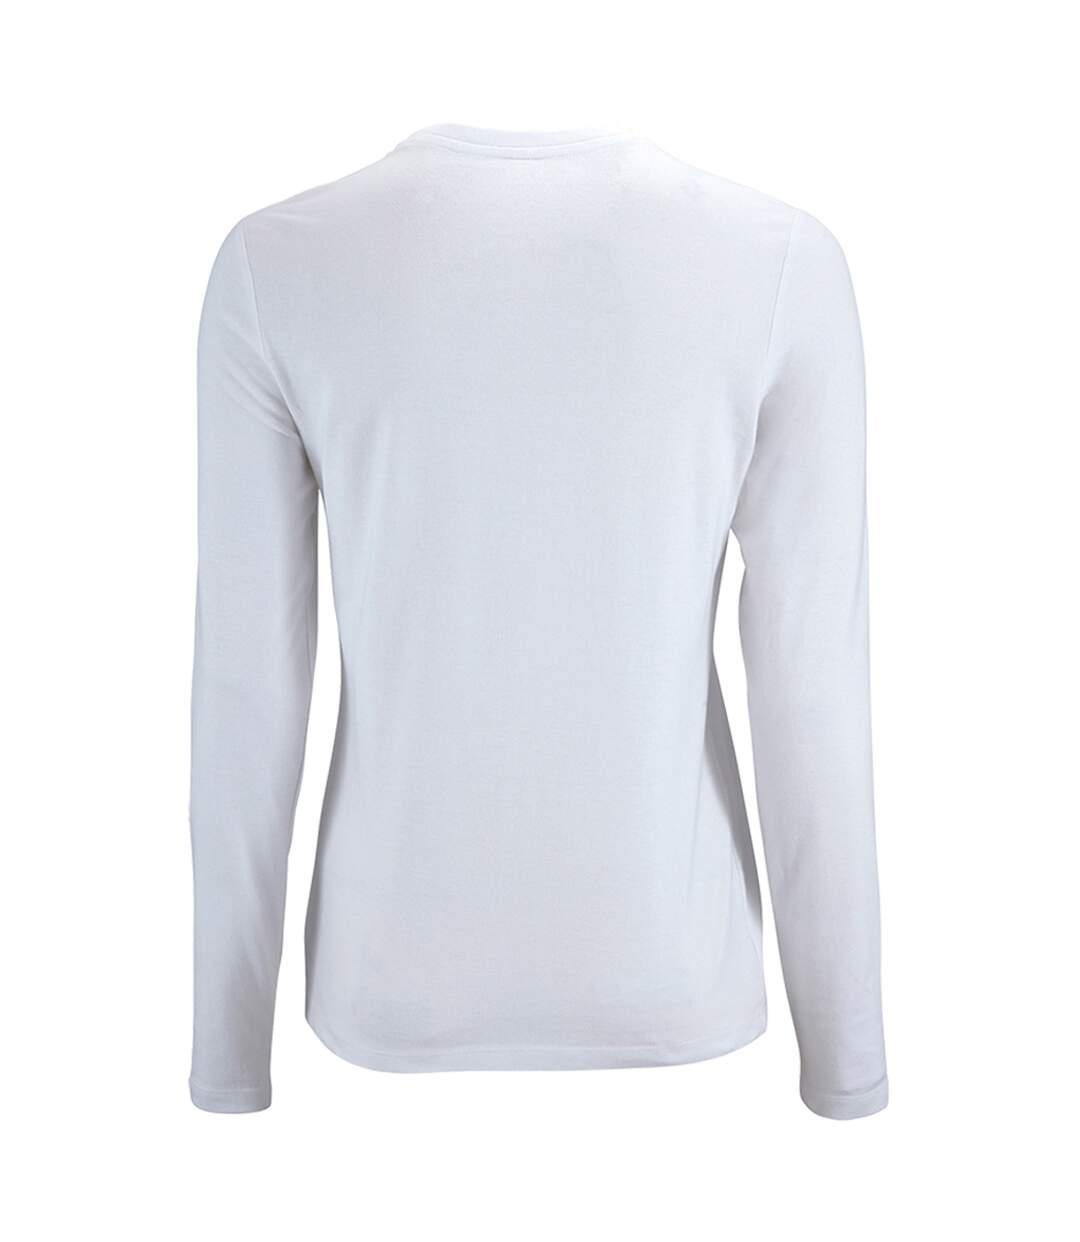 Sols - T-Shirt Manches Longues Imperial - Femme (Blanc) - UTPC2906